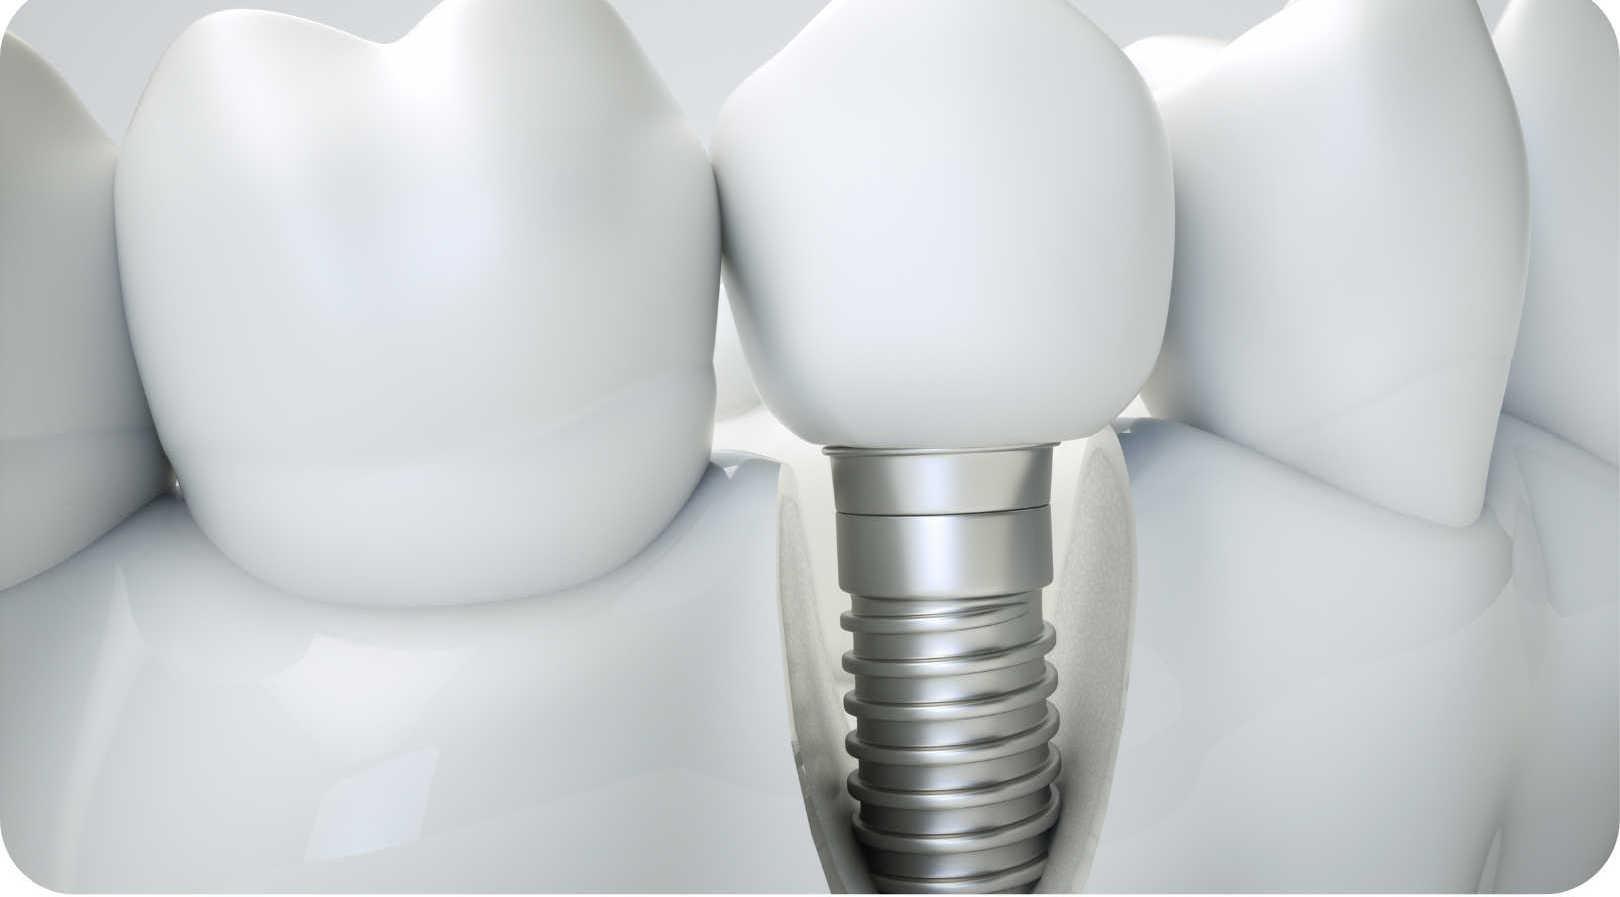 Dental implants at St Clair Family Dental